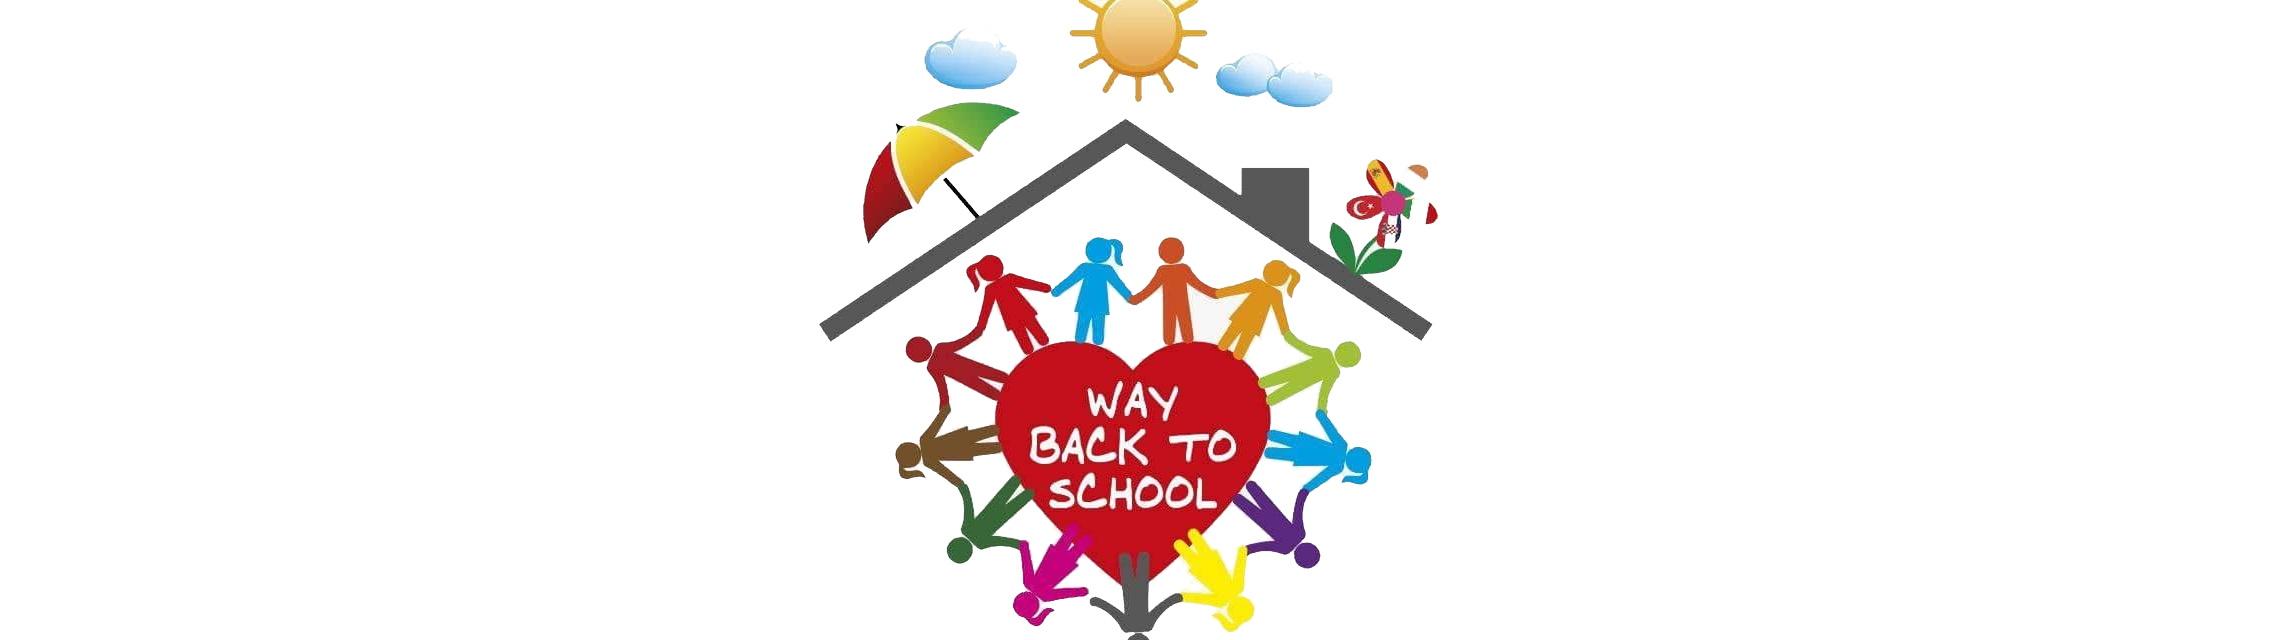 Way Back to School